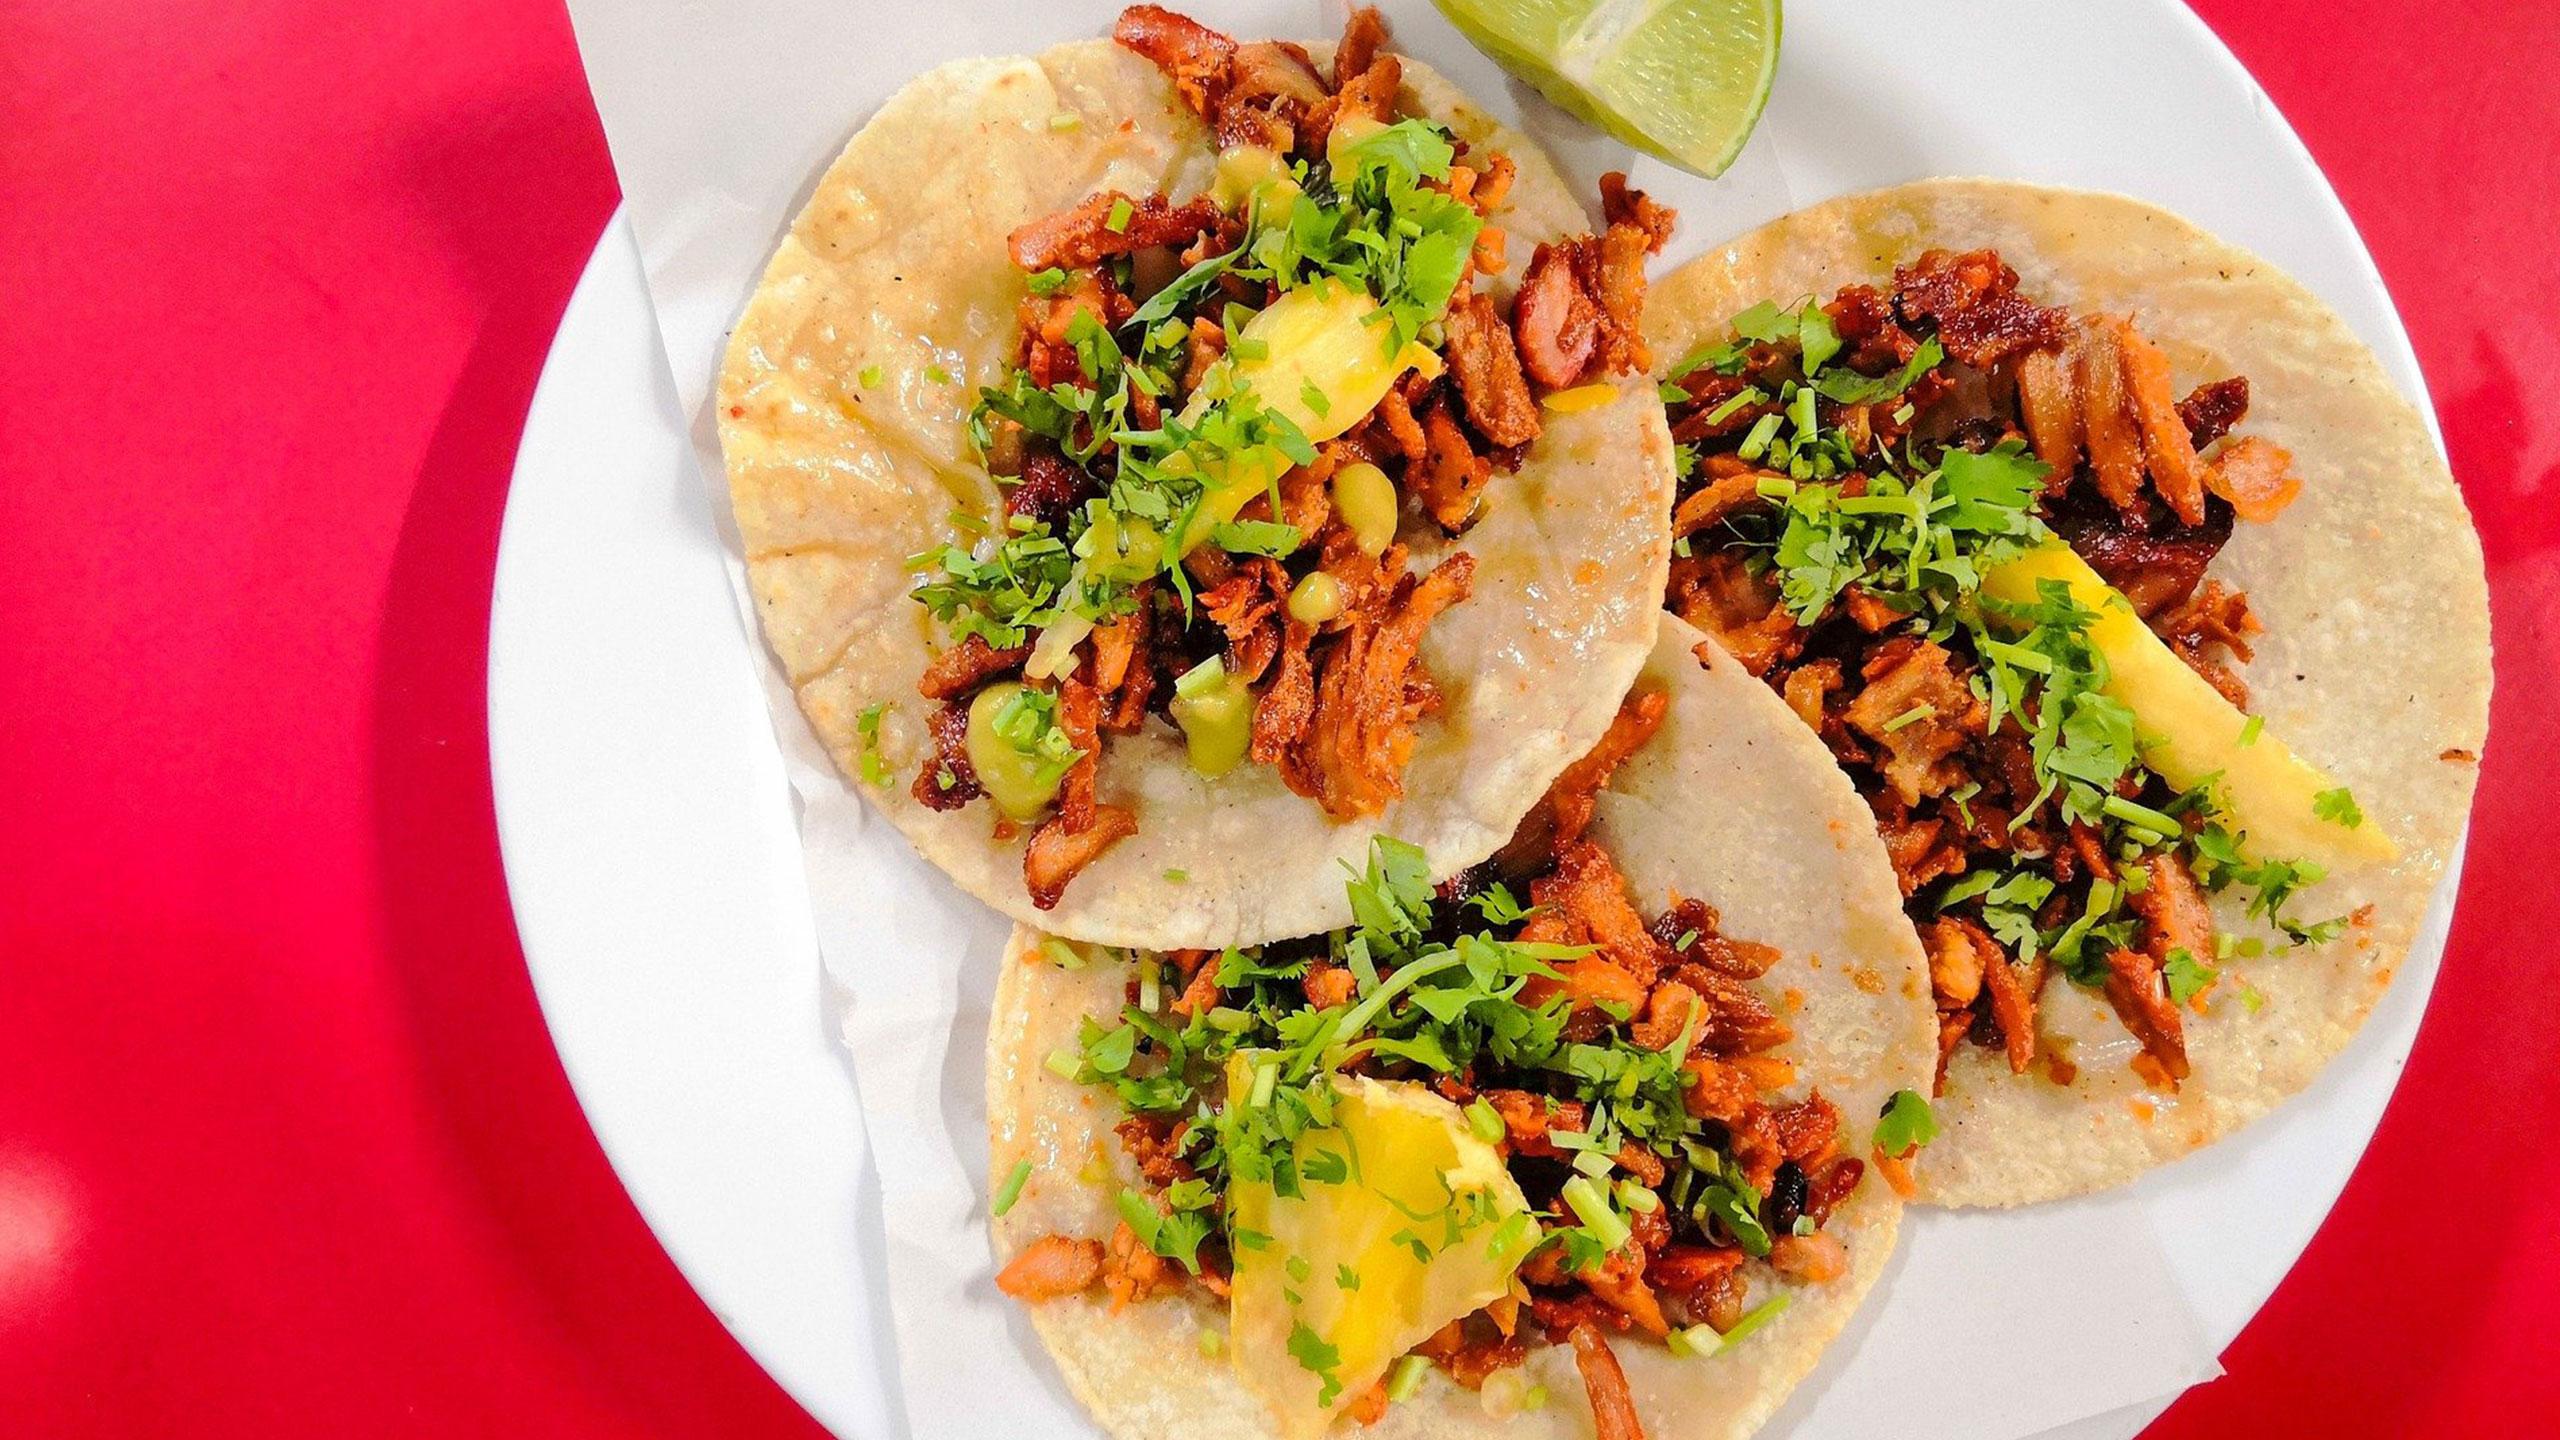 trompo-tacos-al-pastor